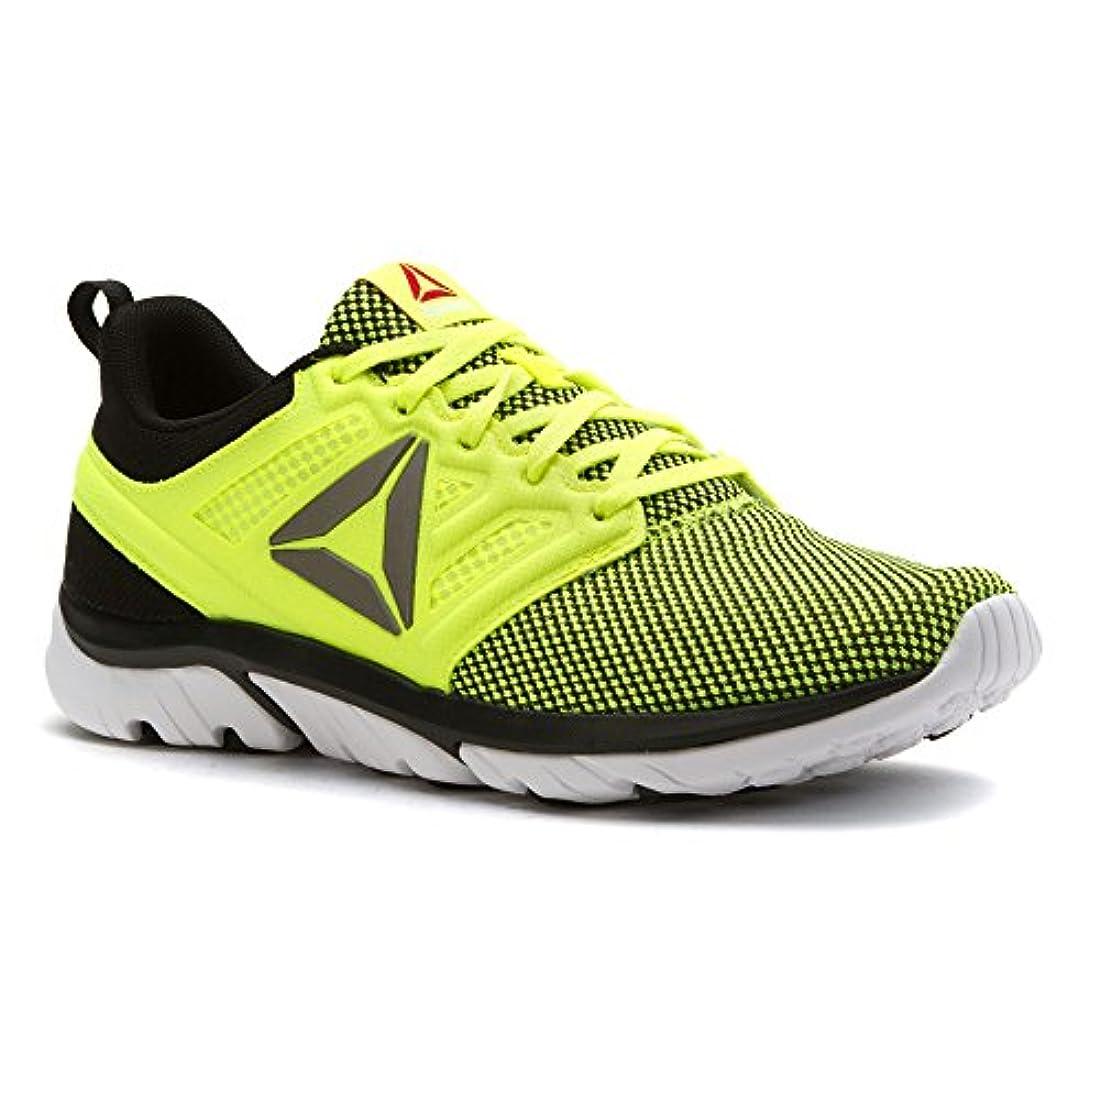 Reebok Mens Running Shoes Black/White/Solar Yellow